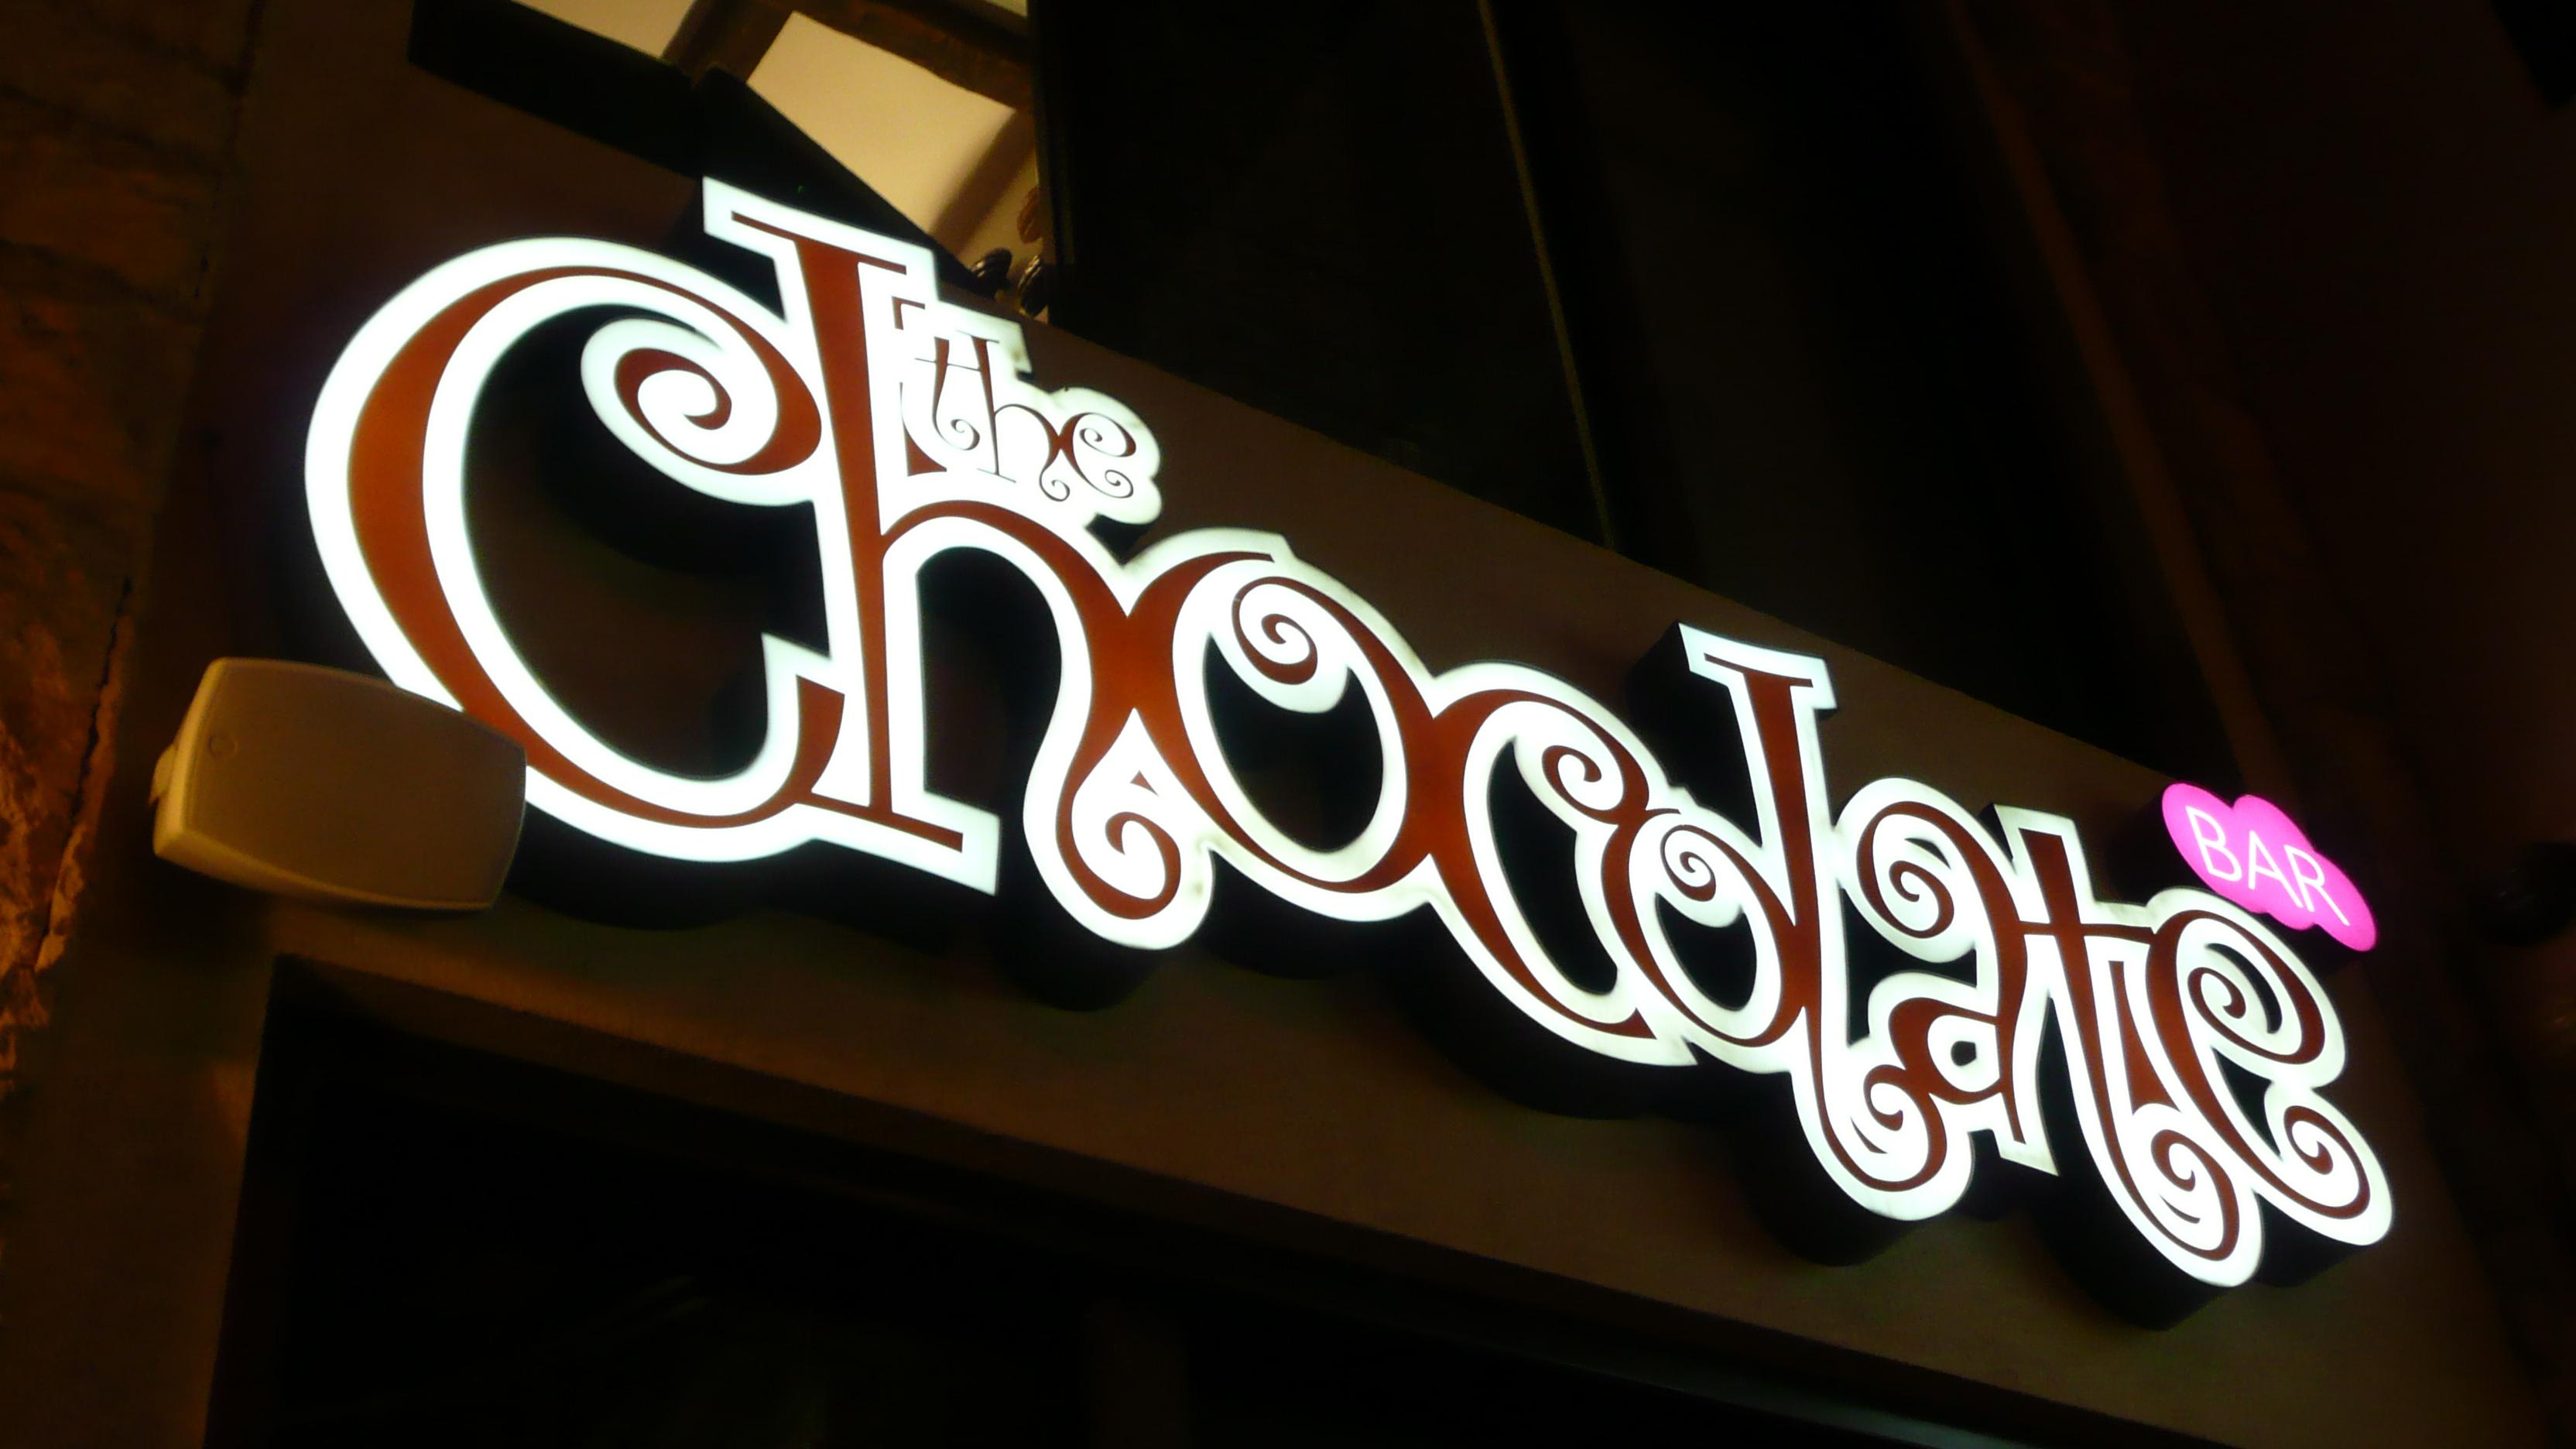 File:The Chocolate Bar - Yum!.jpg - Wikimedia Commons